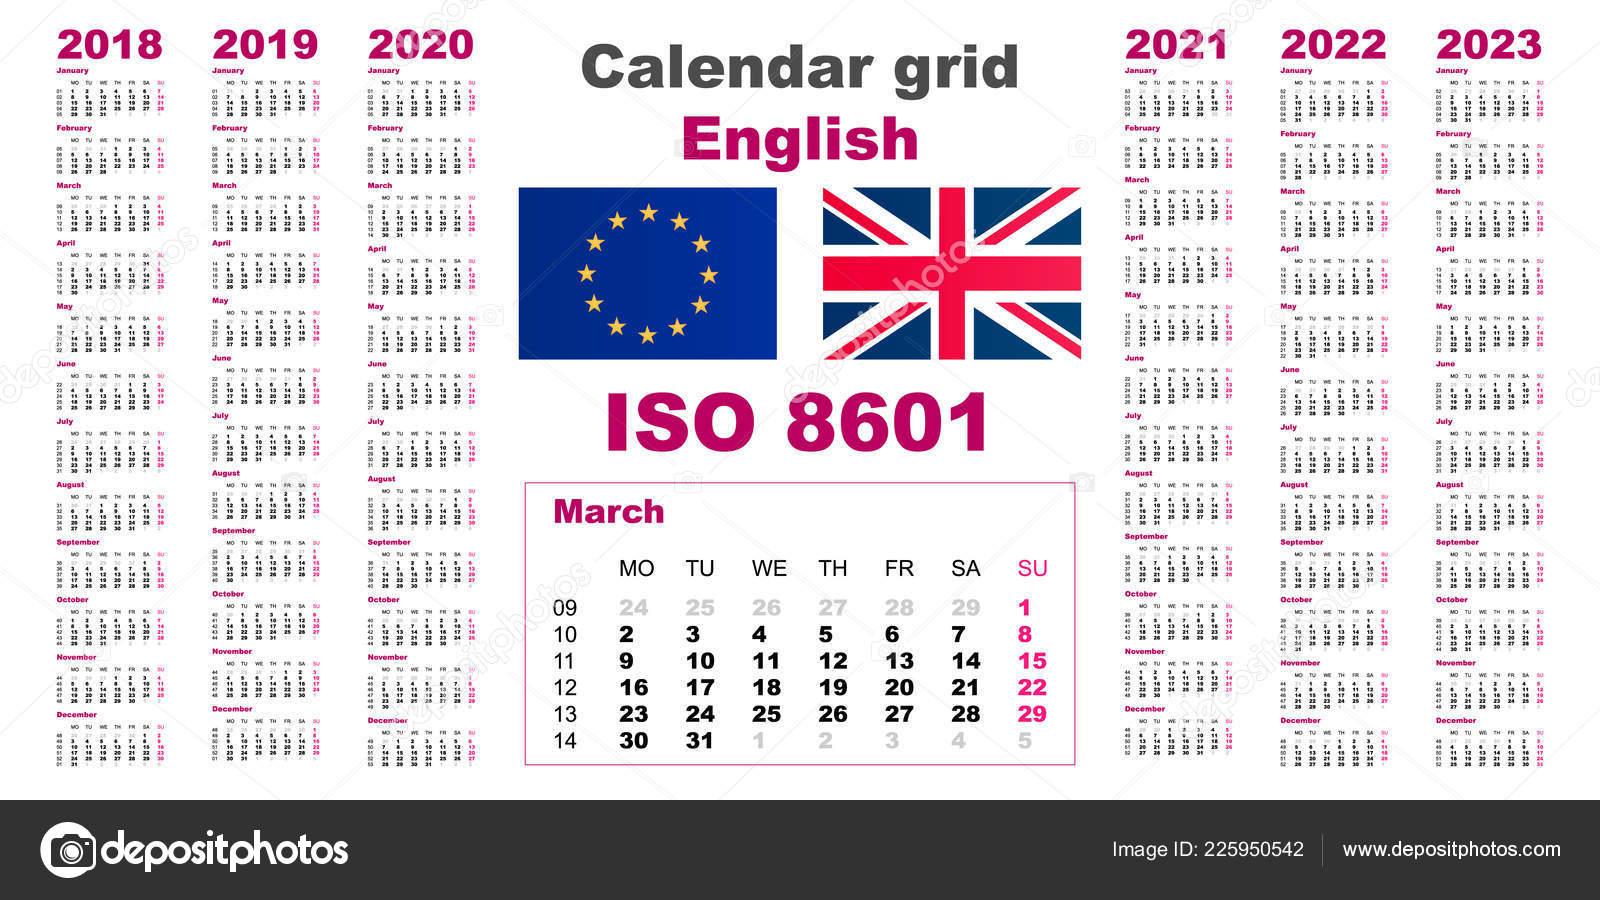 Set Grid Wall Calendar English For 2018, 2019, 2020, 2021